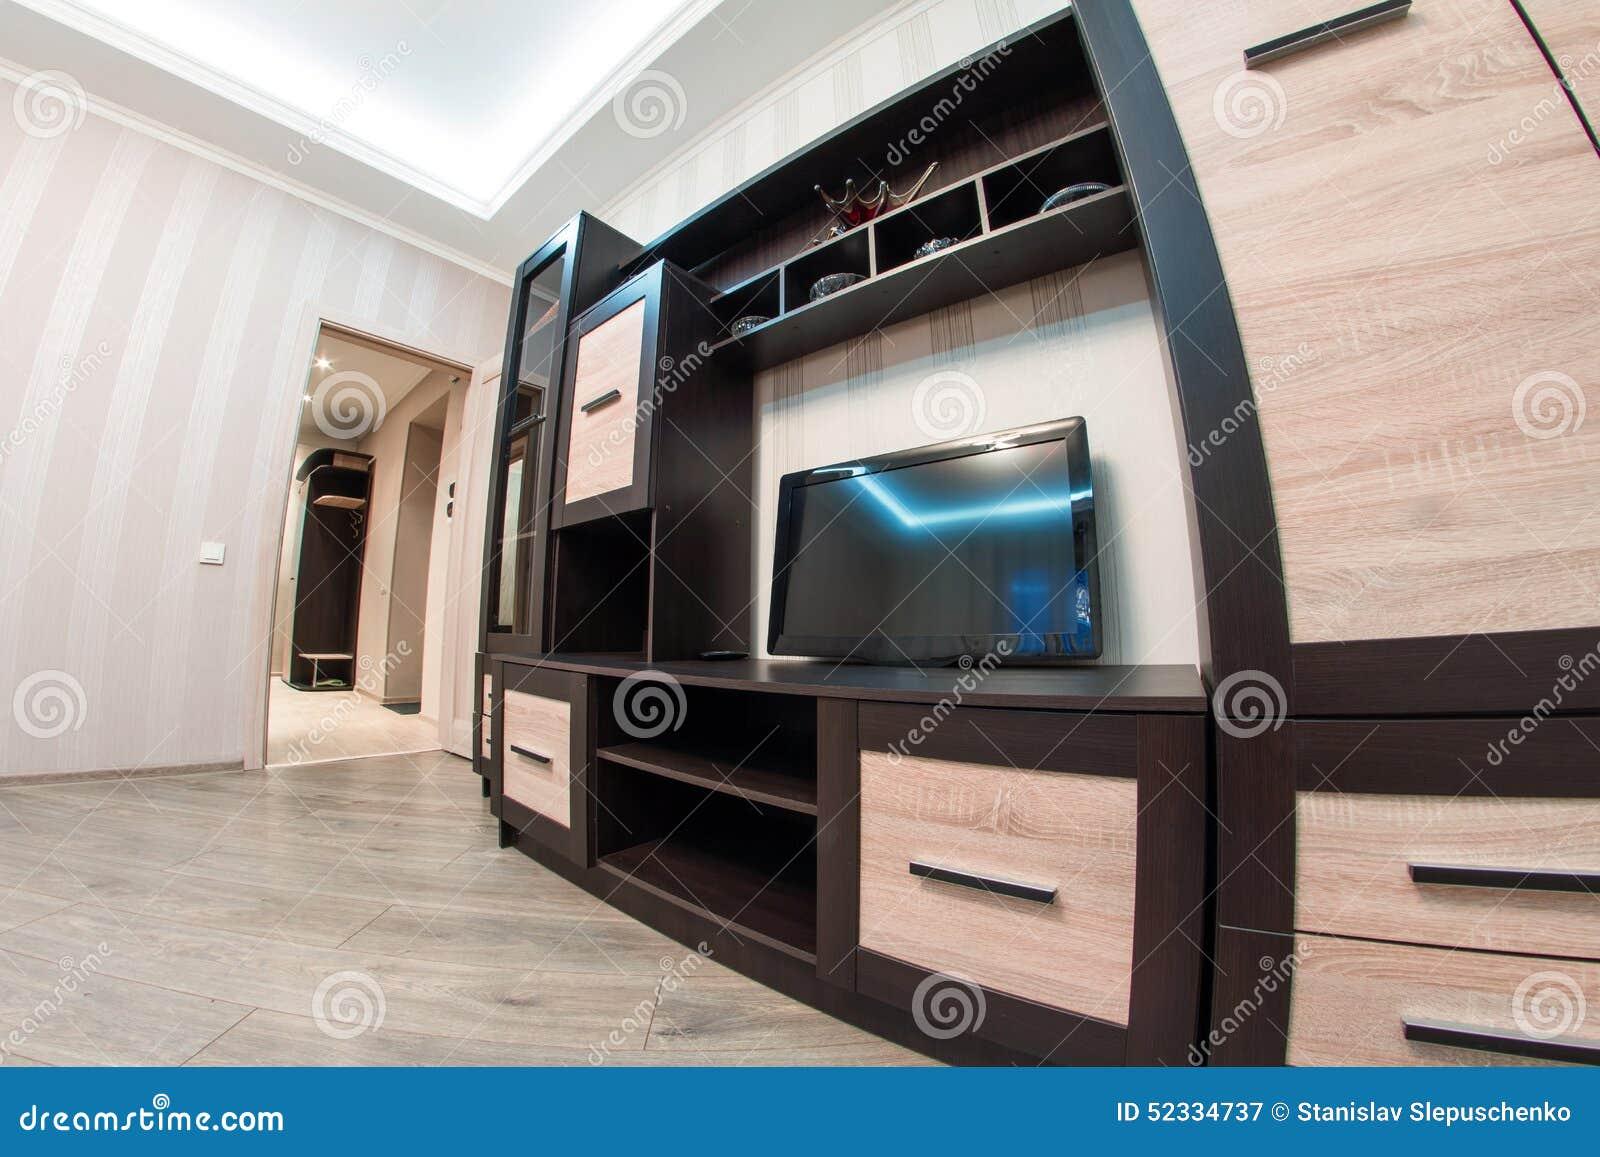 Ruime ruimte met meubilair grote kast en tv stock afbeelding afbeelding 52334737 - Meubilair tv industrie ...